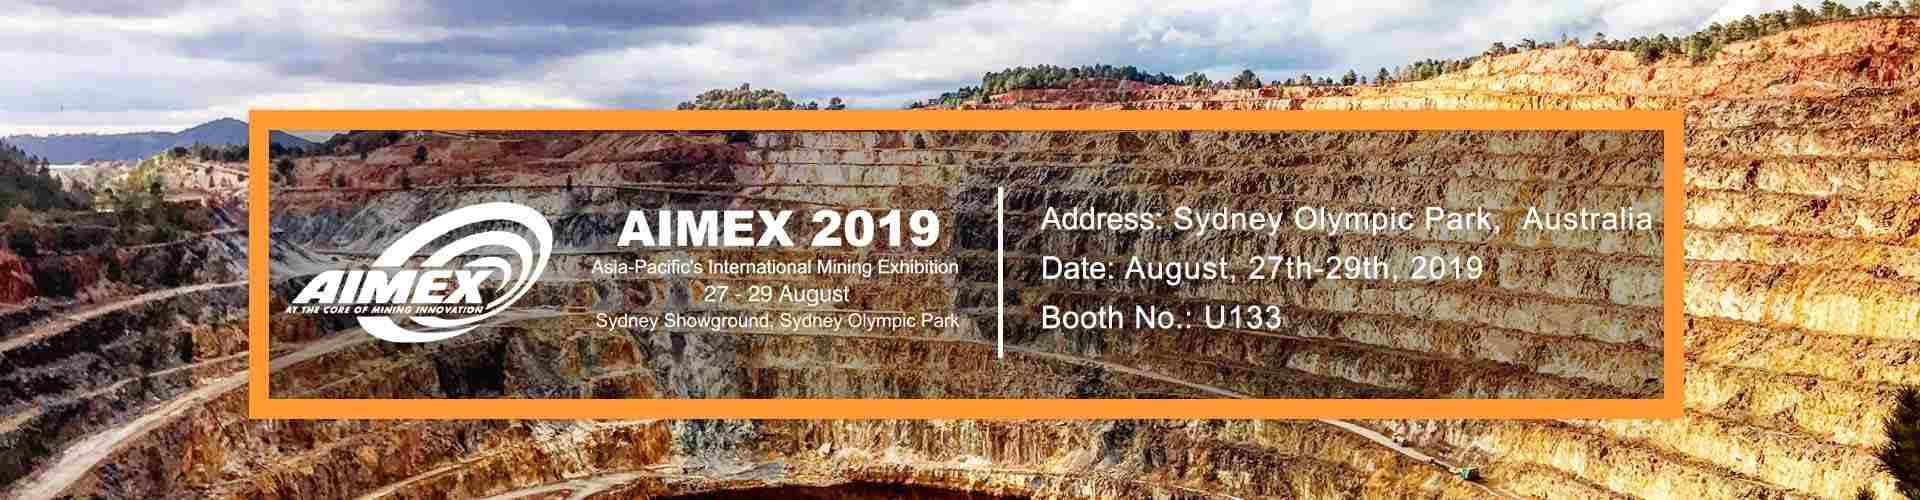 AIMEX 2019 in Australia